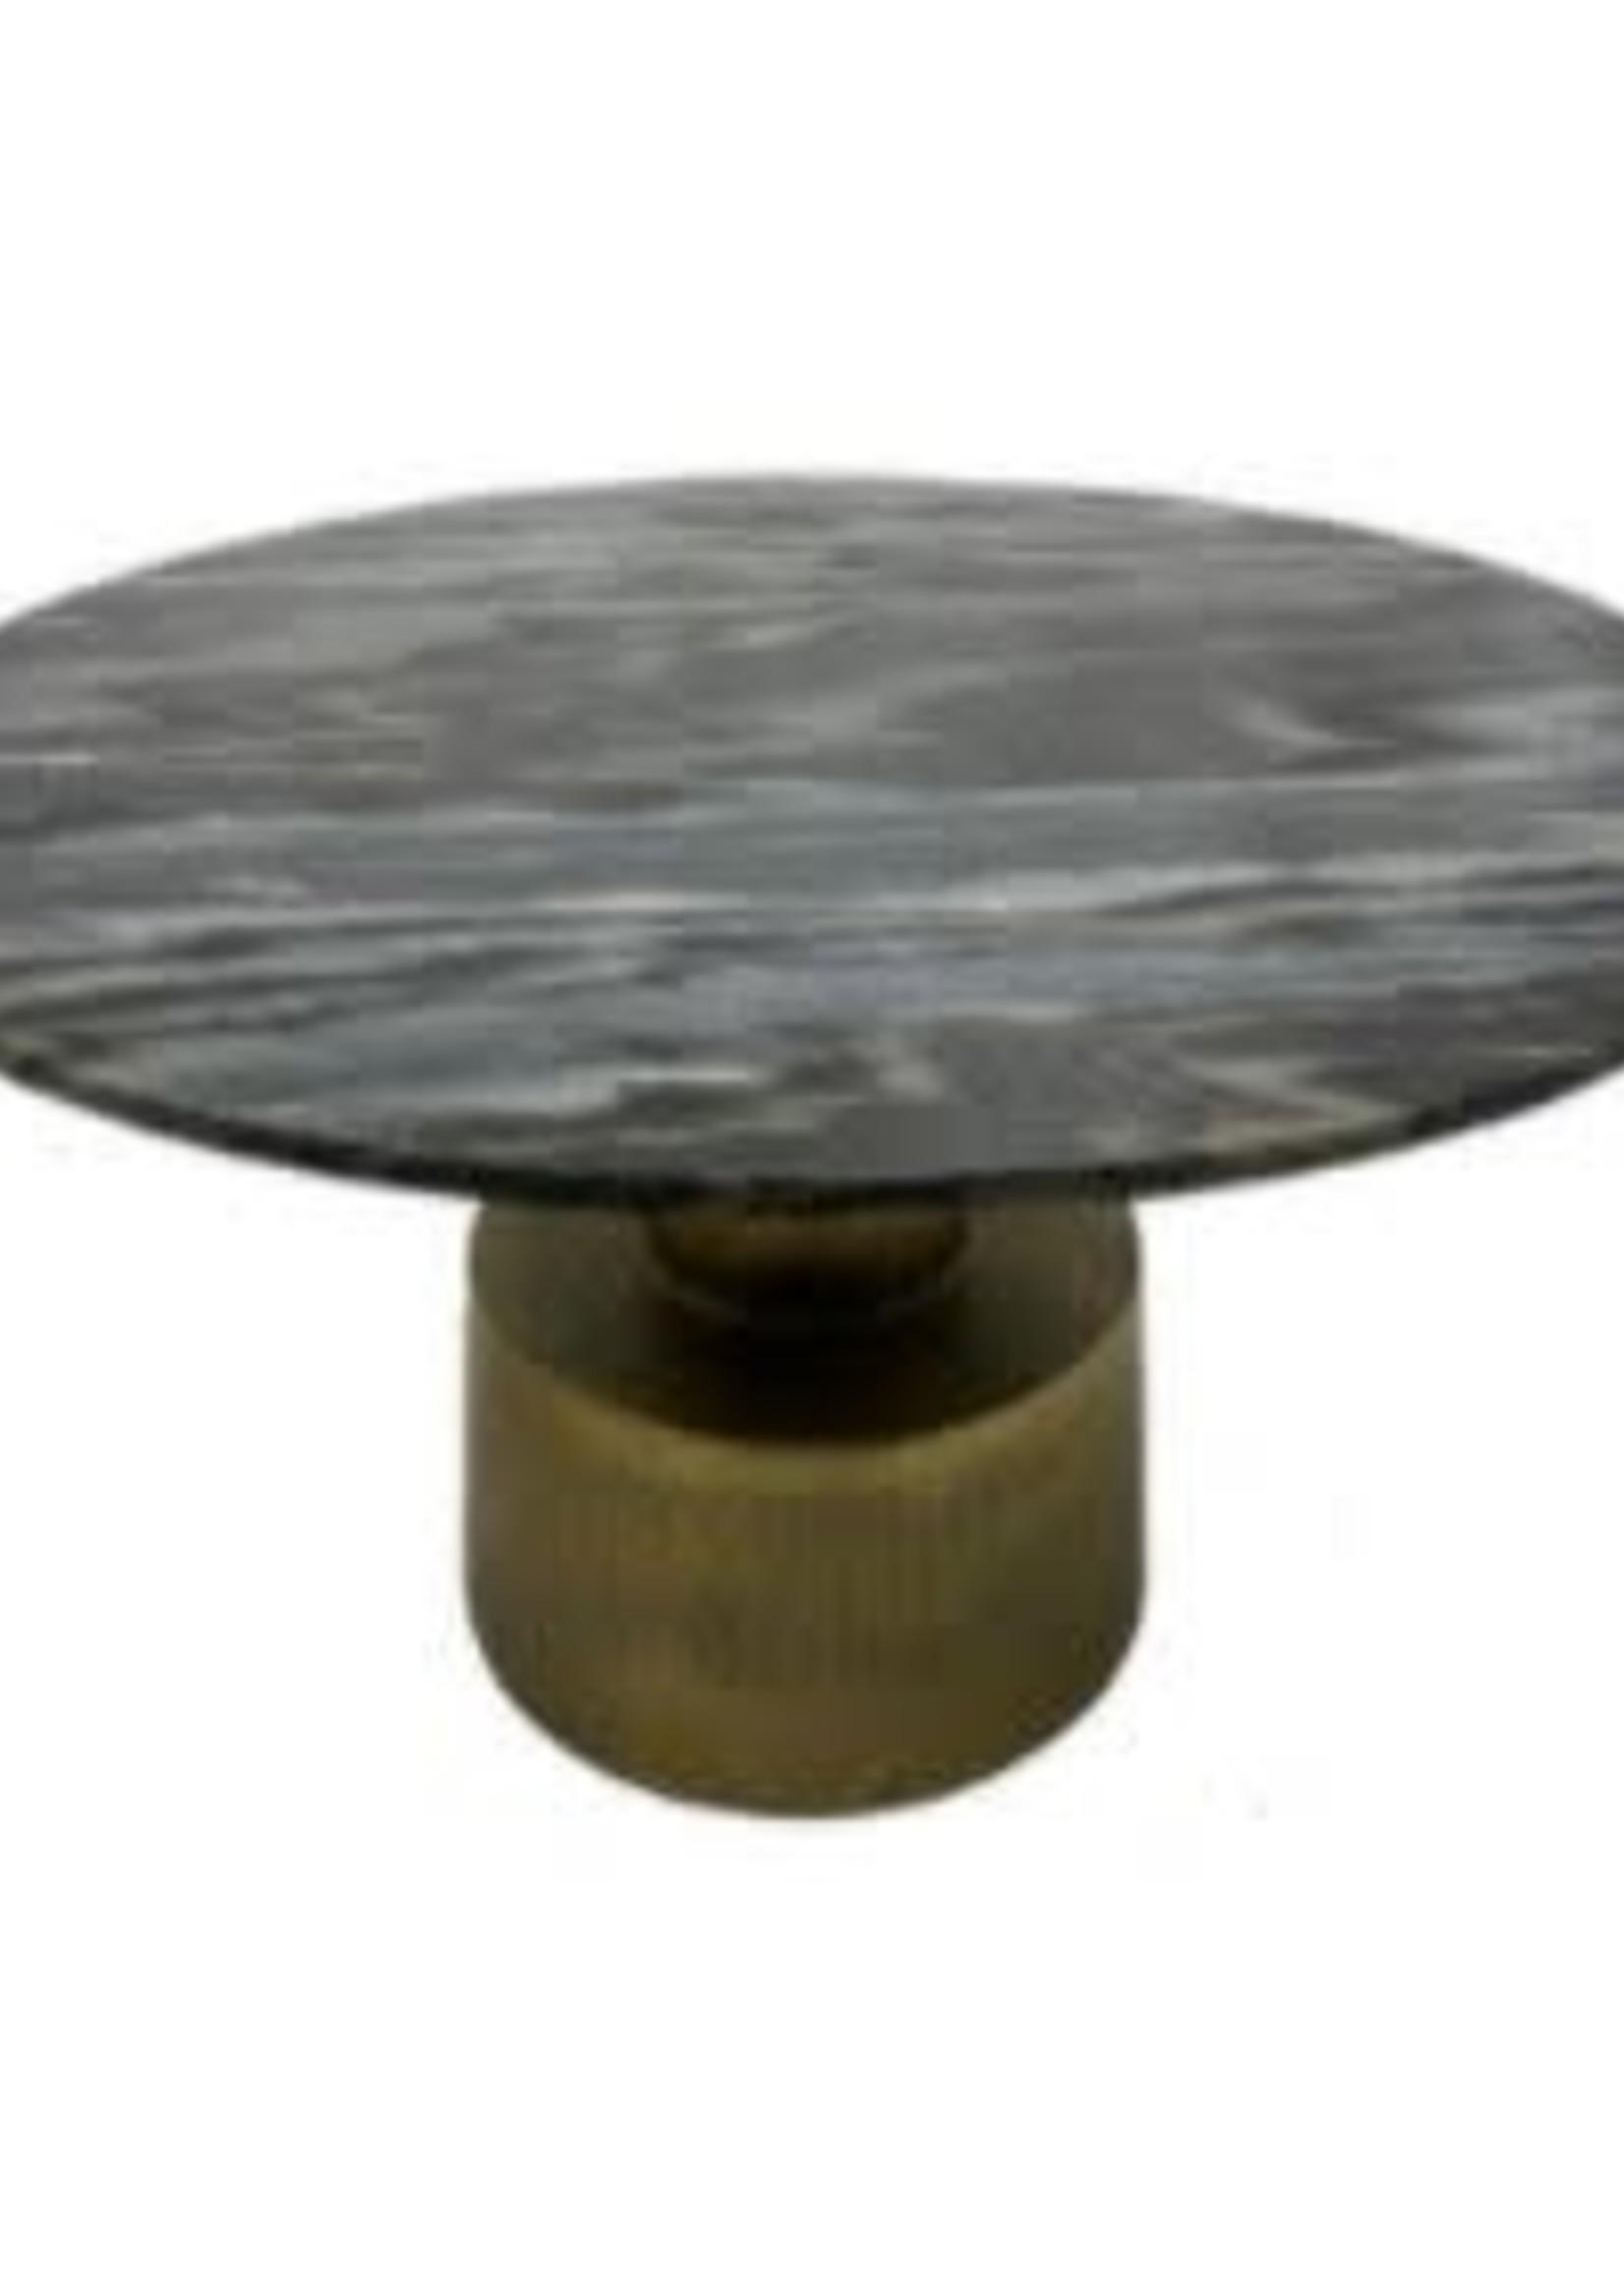 Moods Collection Ronde tafel groen marmer&antique goud alu 77x77x45